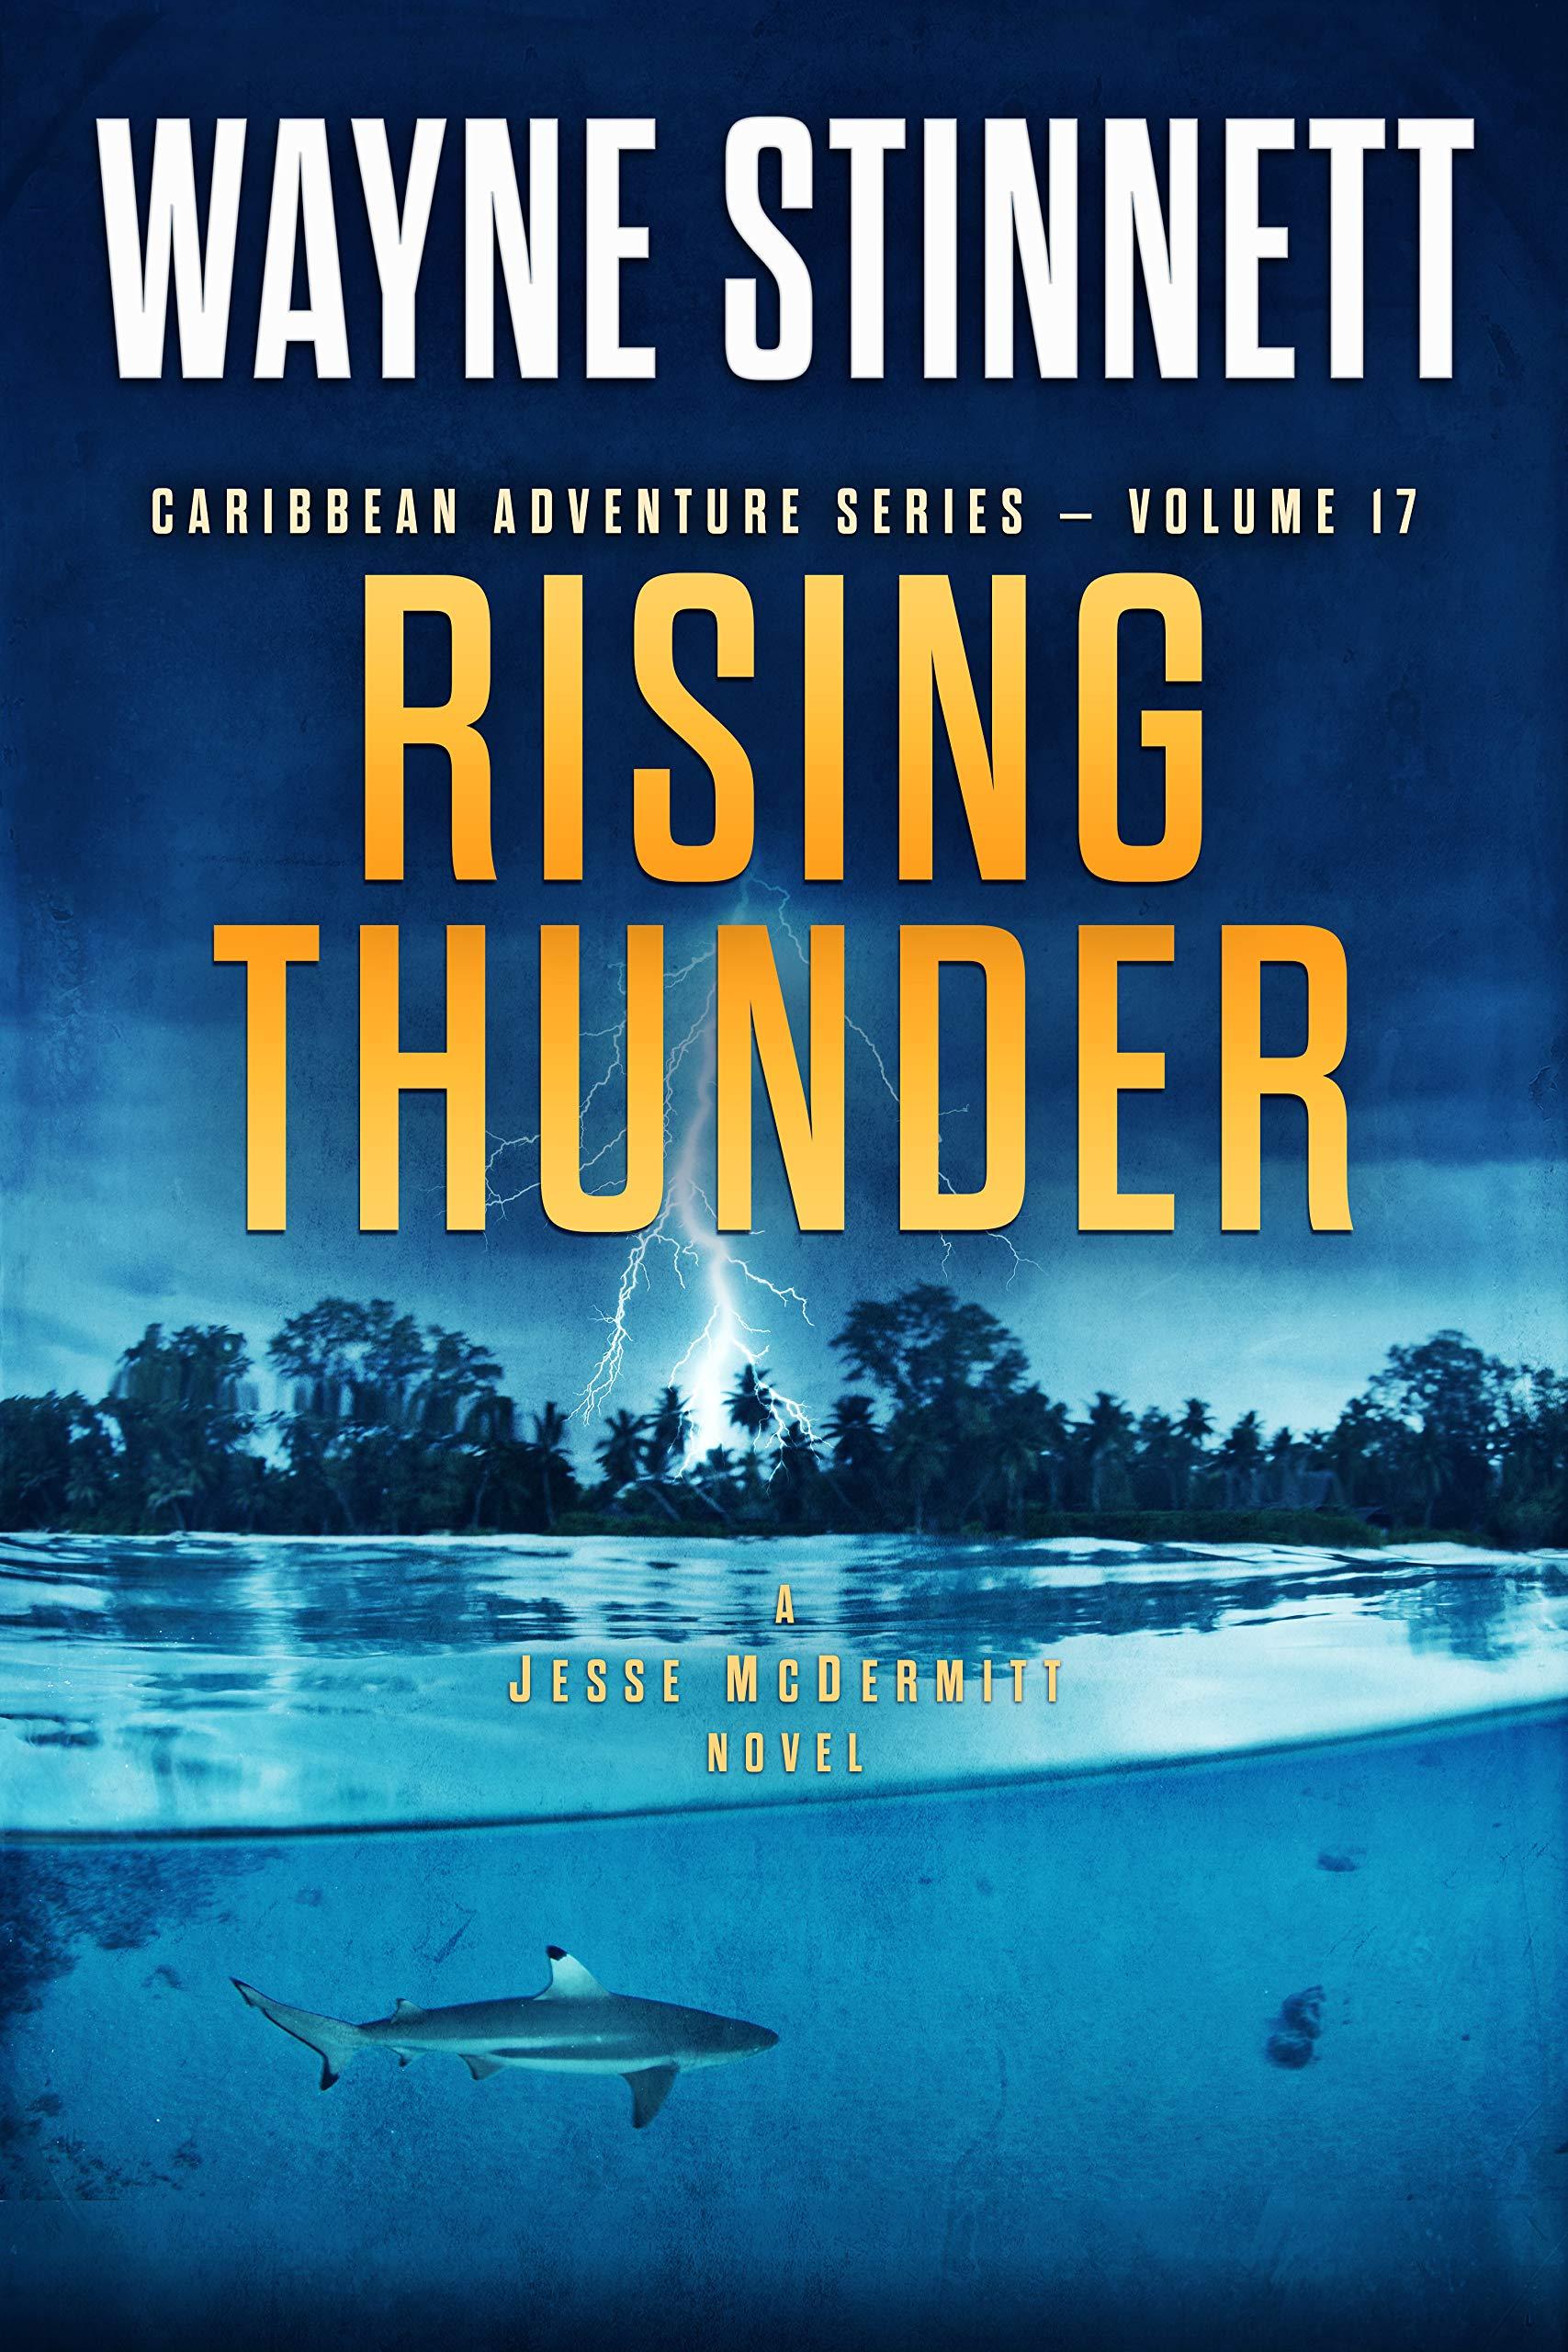 Rising Thunder: A Jesse McDermitt Novel (Caribbean Adventure Series Book 17)